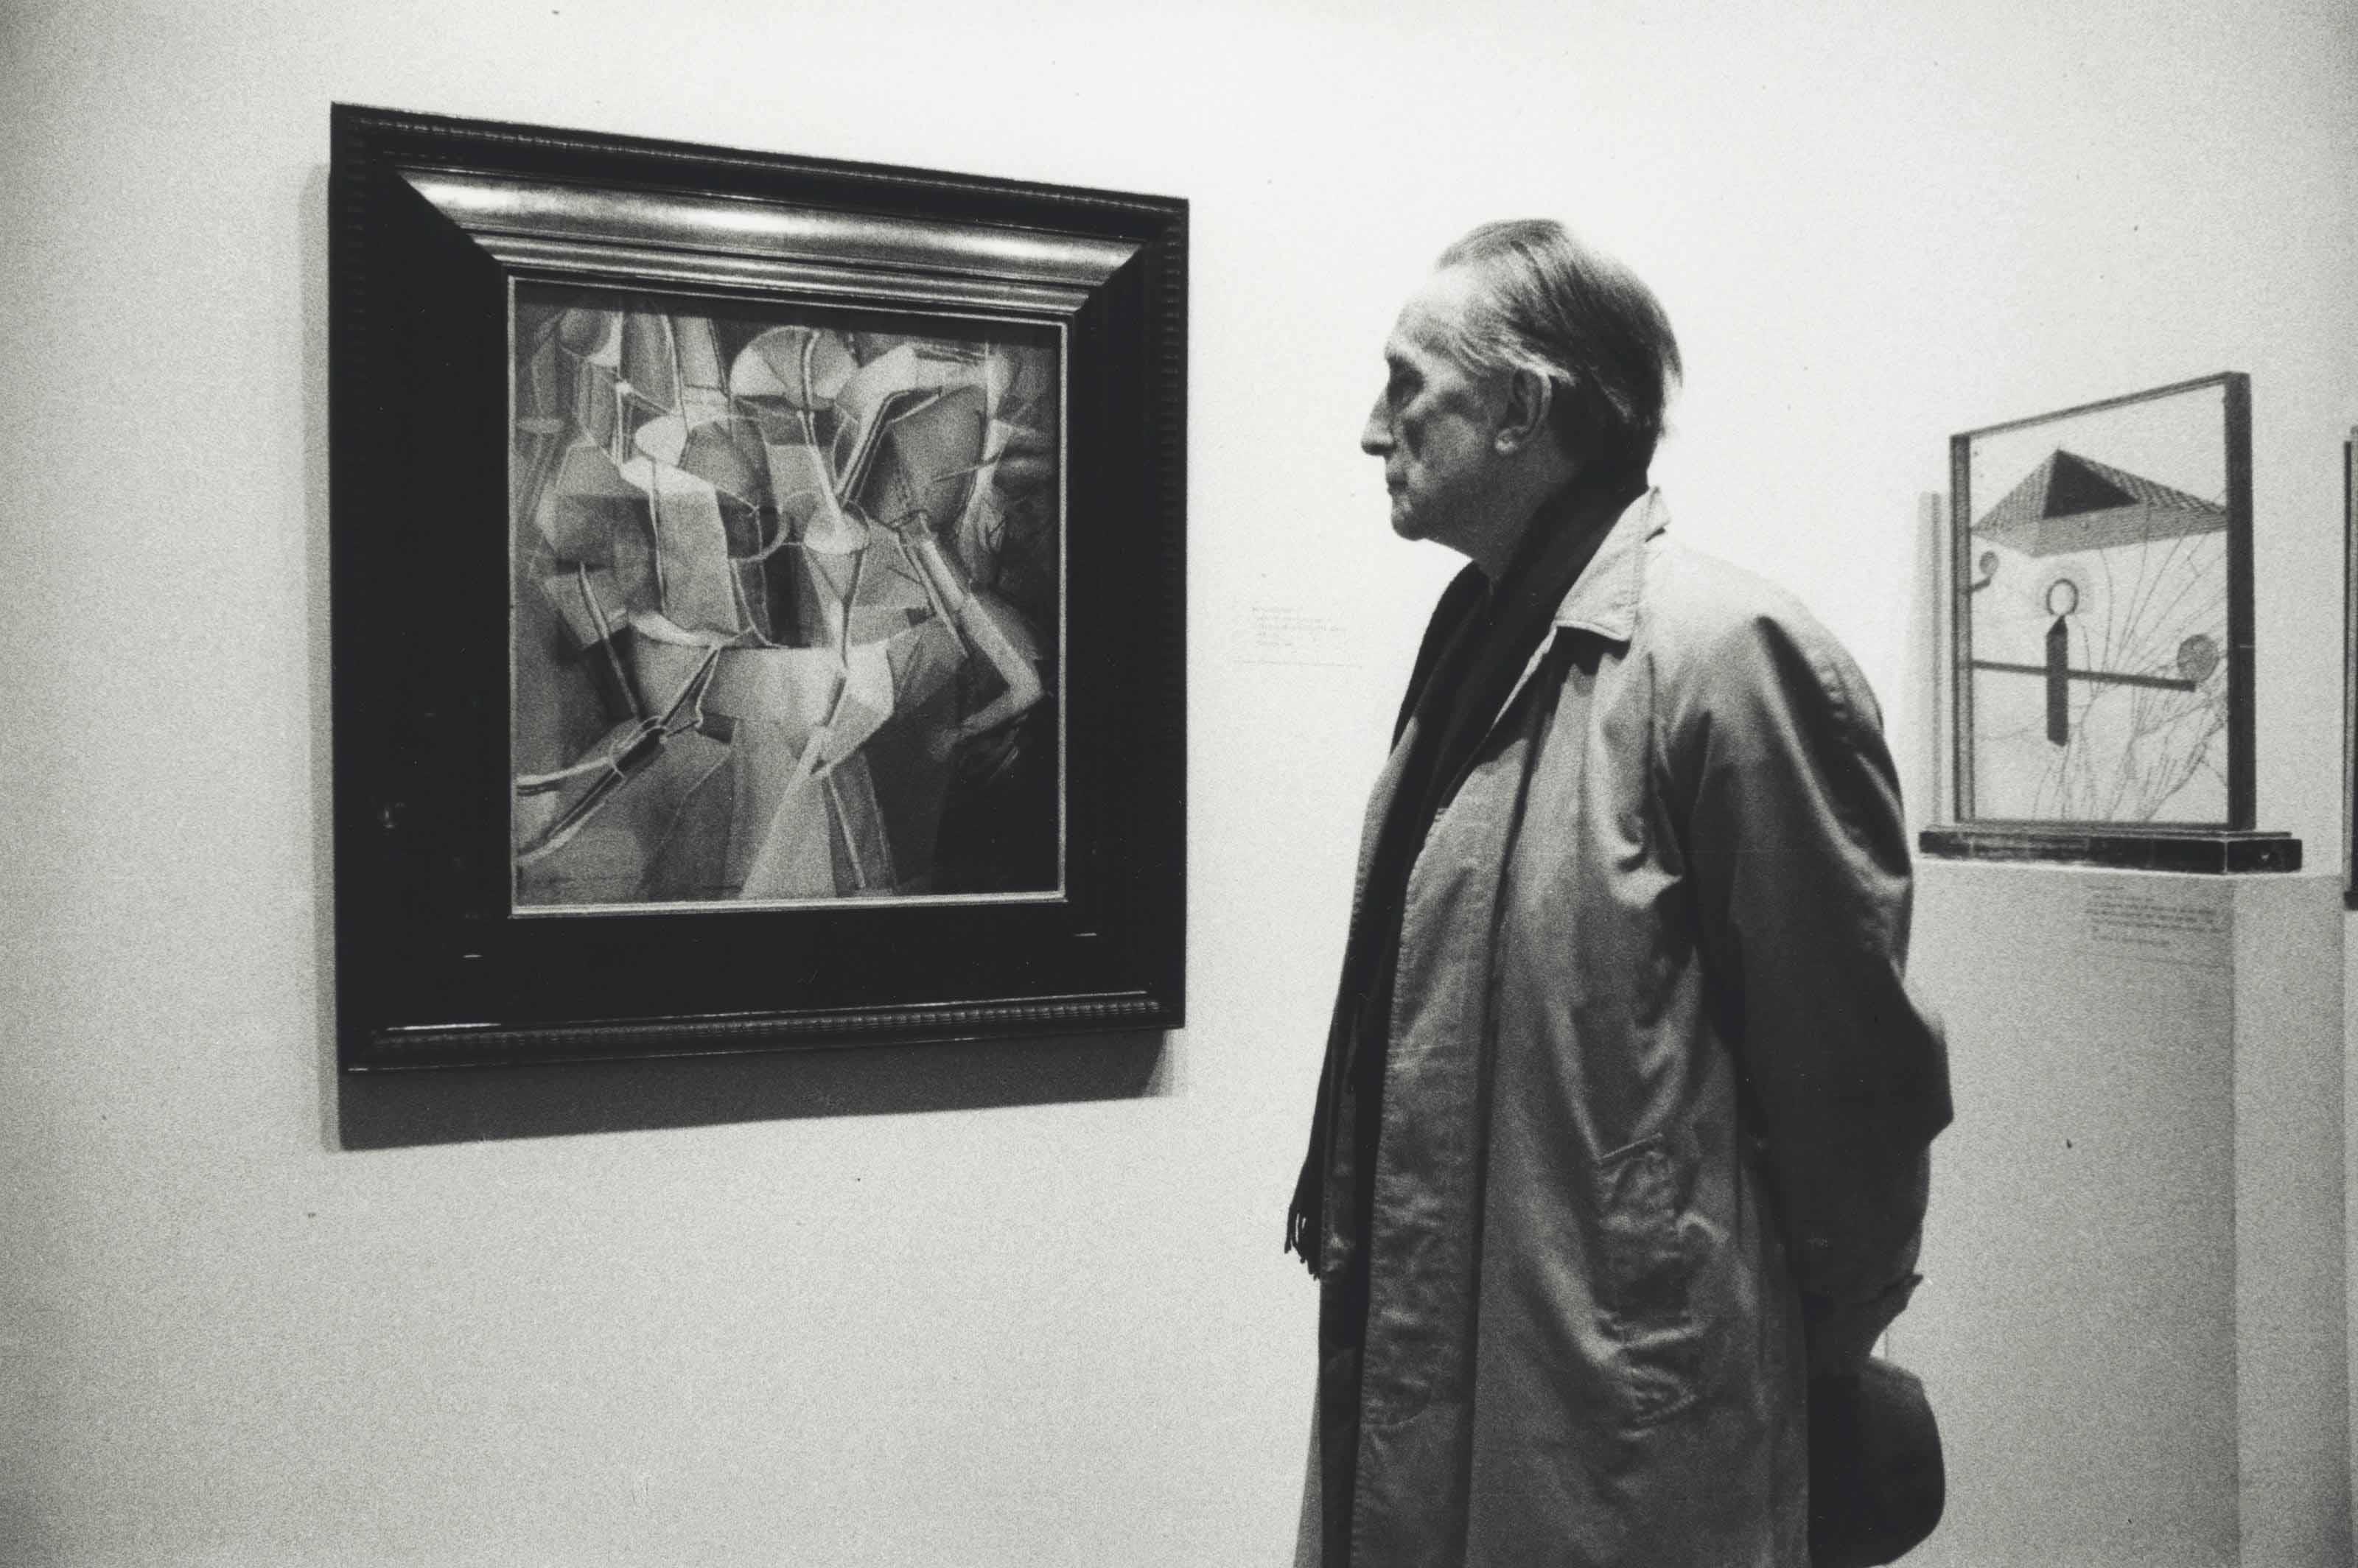 Marcel Duchamp, 1965